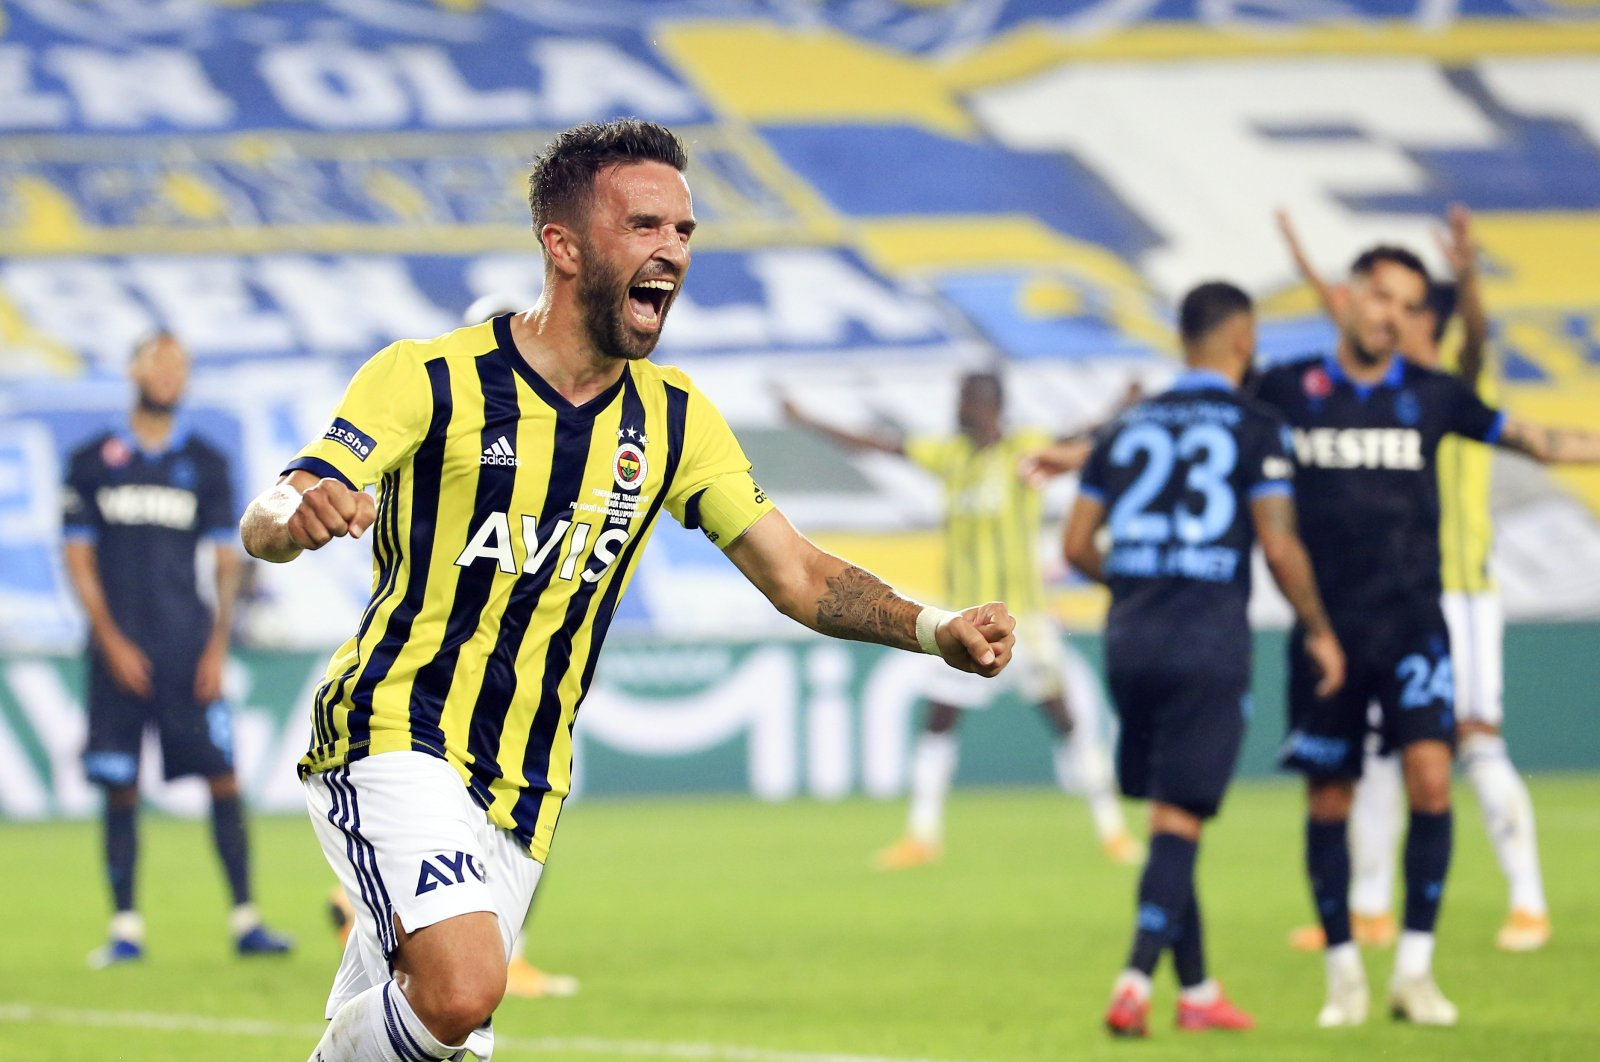 Fenerbahçe's Gökhan Gönül celebrates after Fenerbahçe wins the derby against Trabzonspor, in Trabzon, northern Turkey, Oct, 25, 2020. (AA Photo)